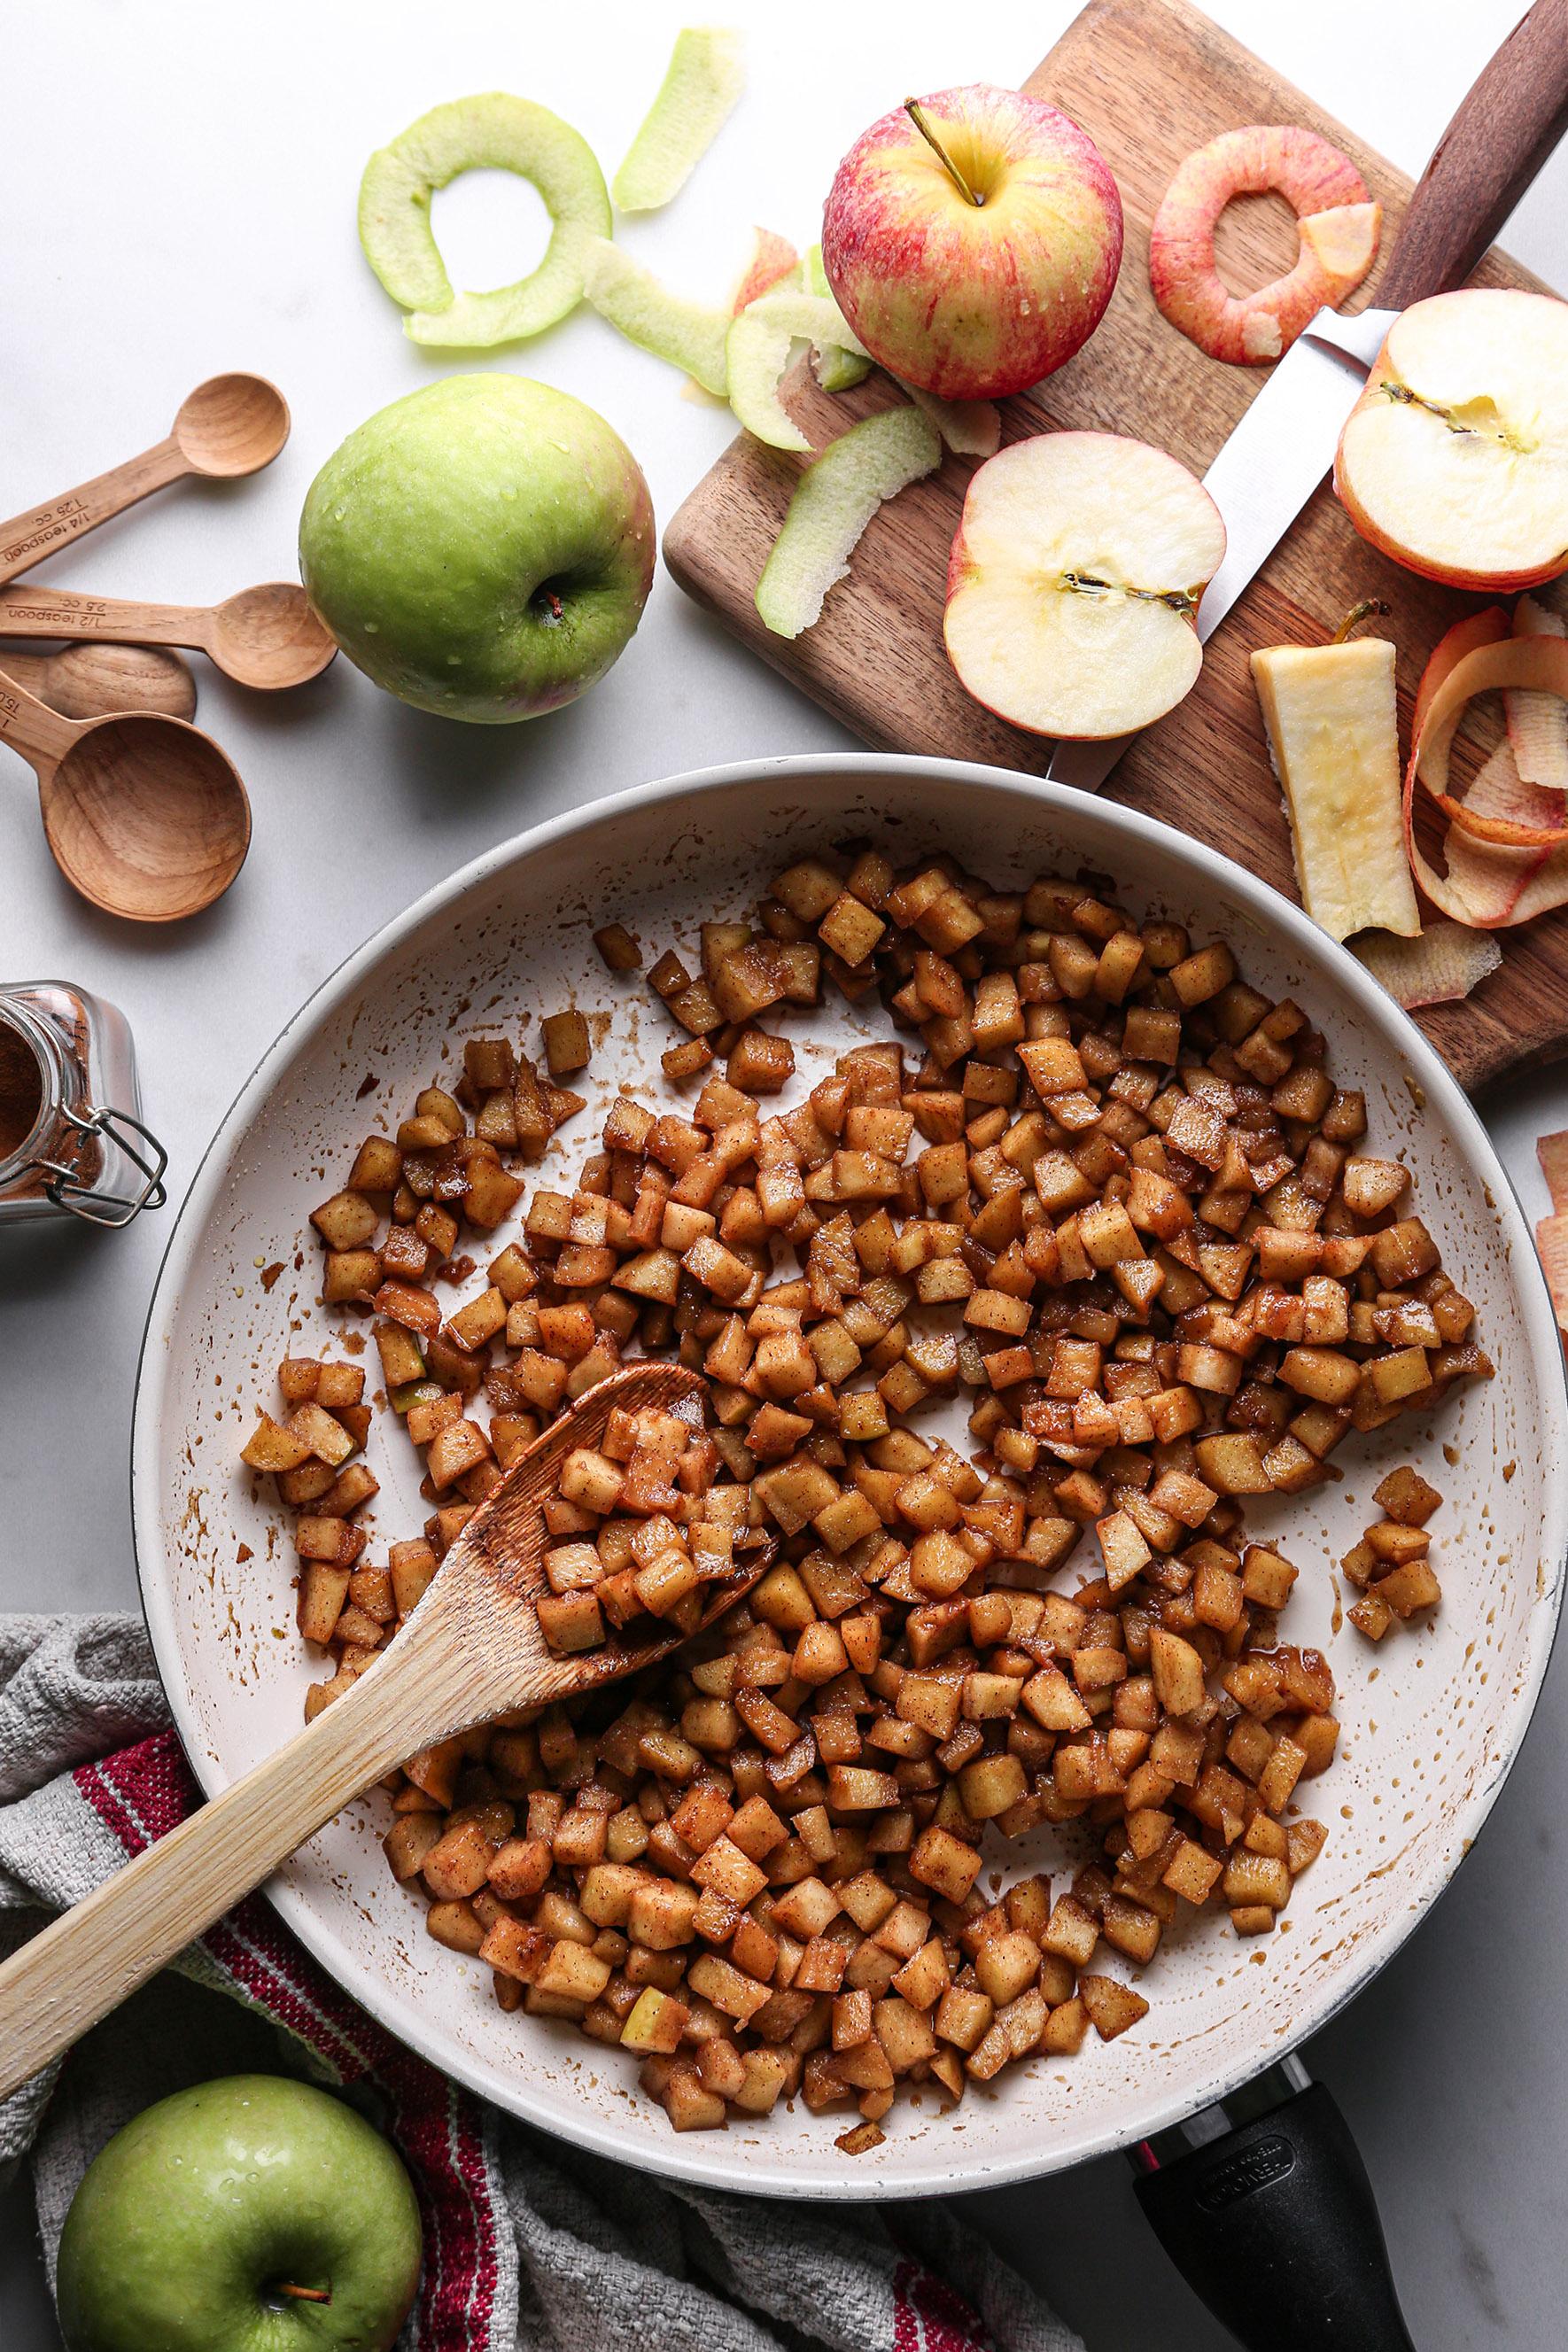 Apple Cinnamon Rolls | Vegan and refined sugar free